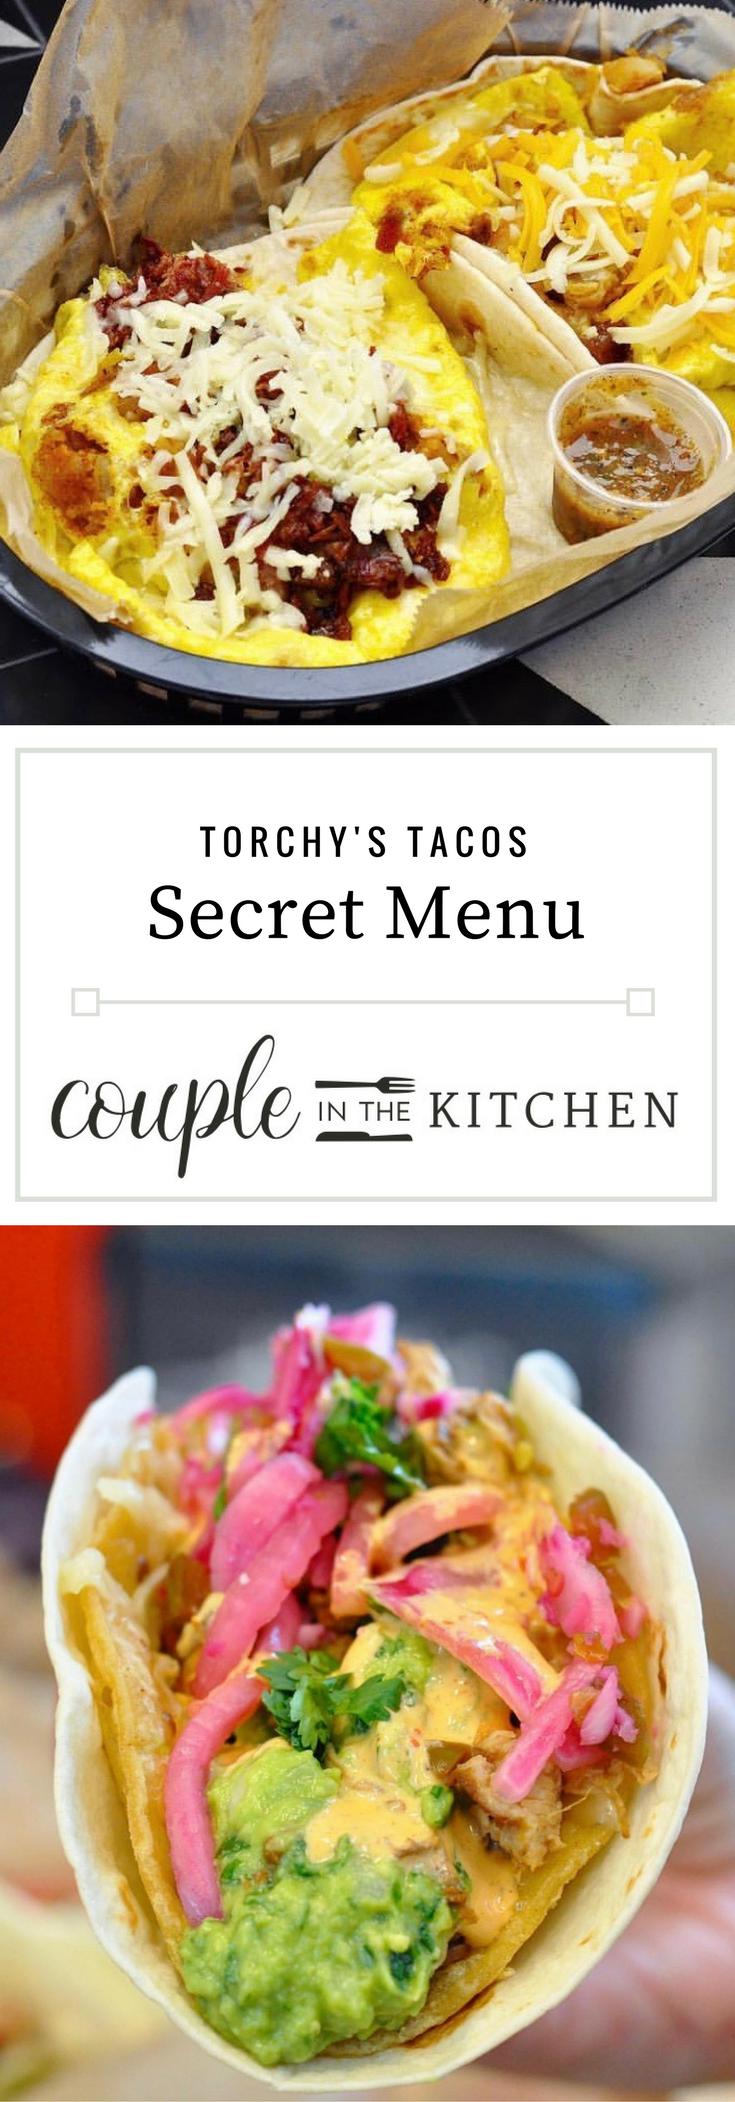 Torchy's Secret Menu   coupleinthekitchen.com